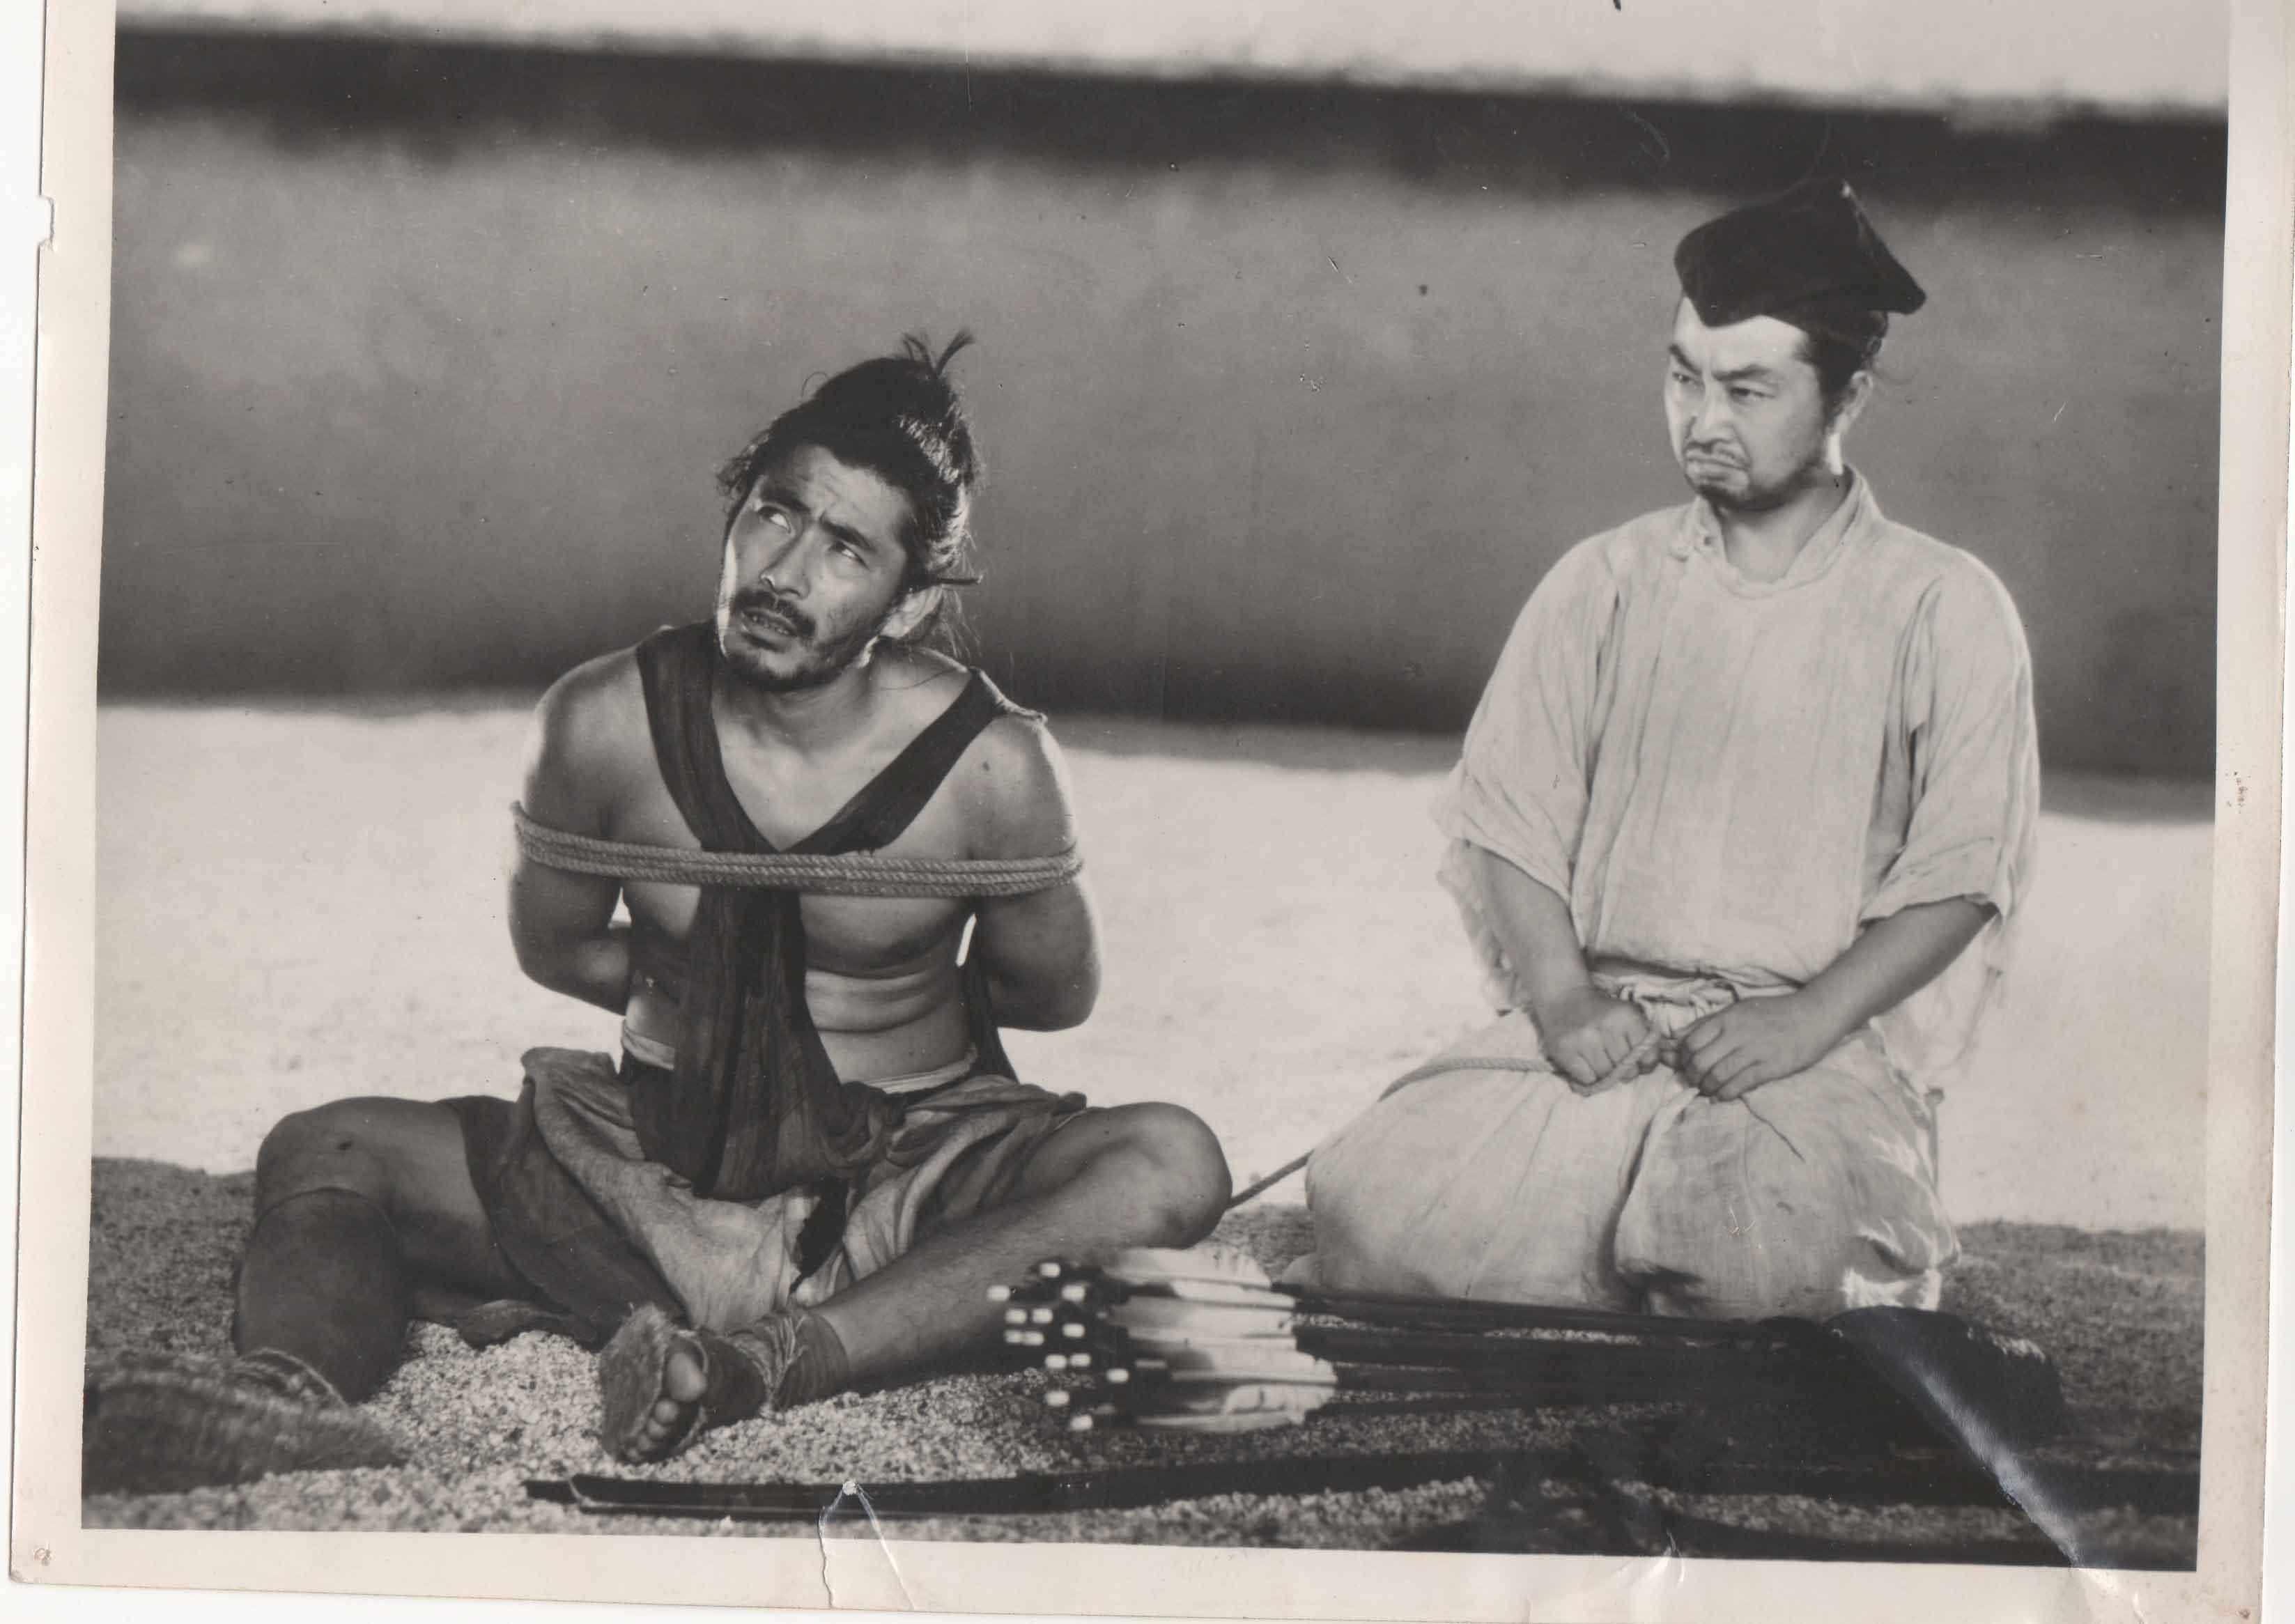 rashomon by akira kurosawa essay Analysis of rashomon akira kurosawa's rashomon (1950) involves the rape of masago, wife of the samurai takehiro, by the bandit tajomaru in a forest as the samurai.